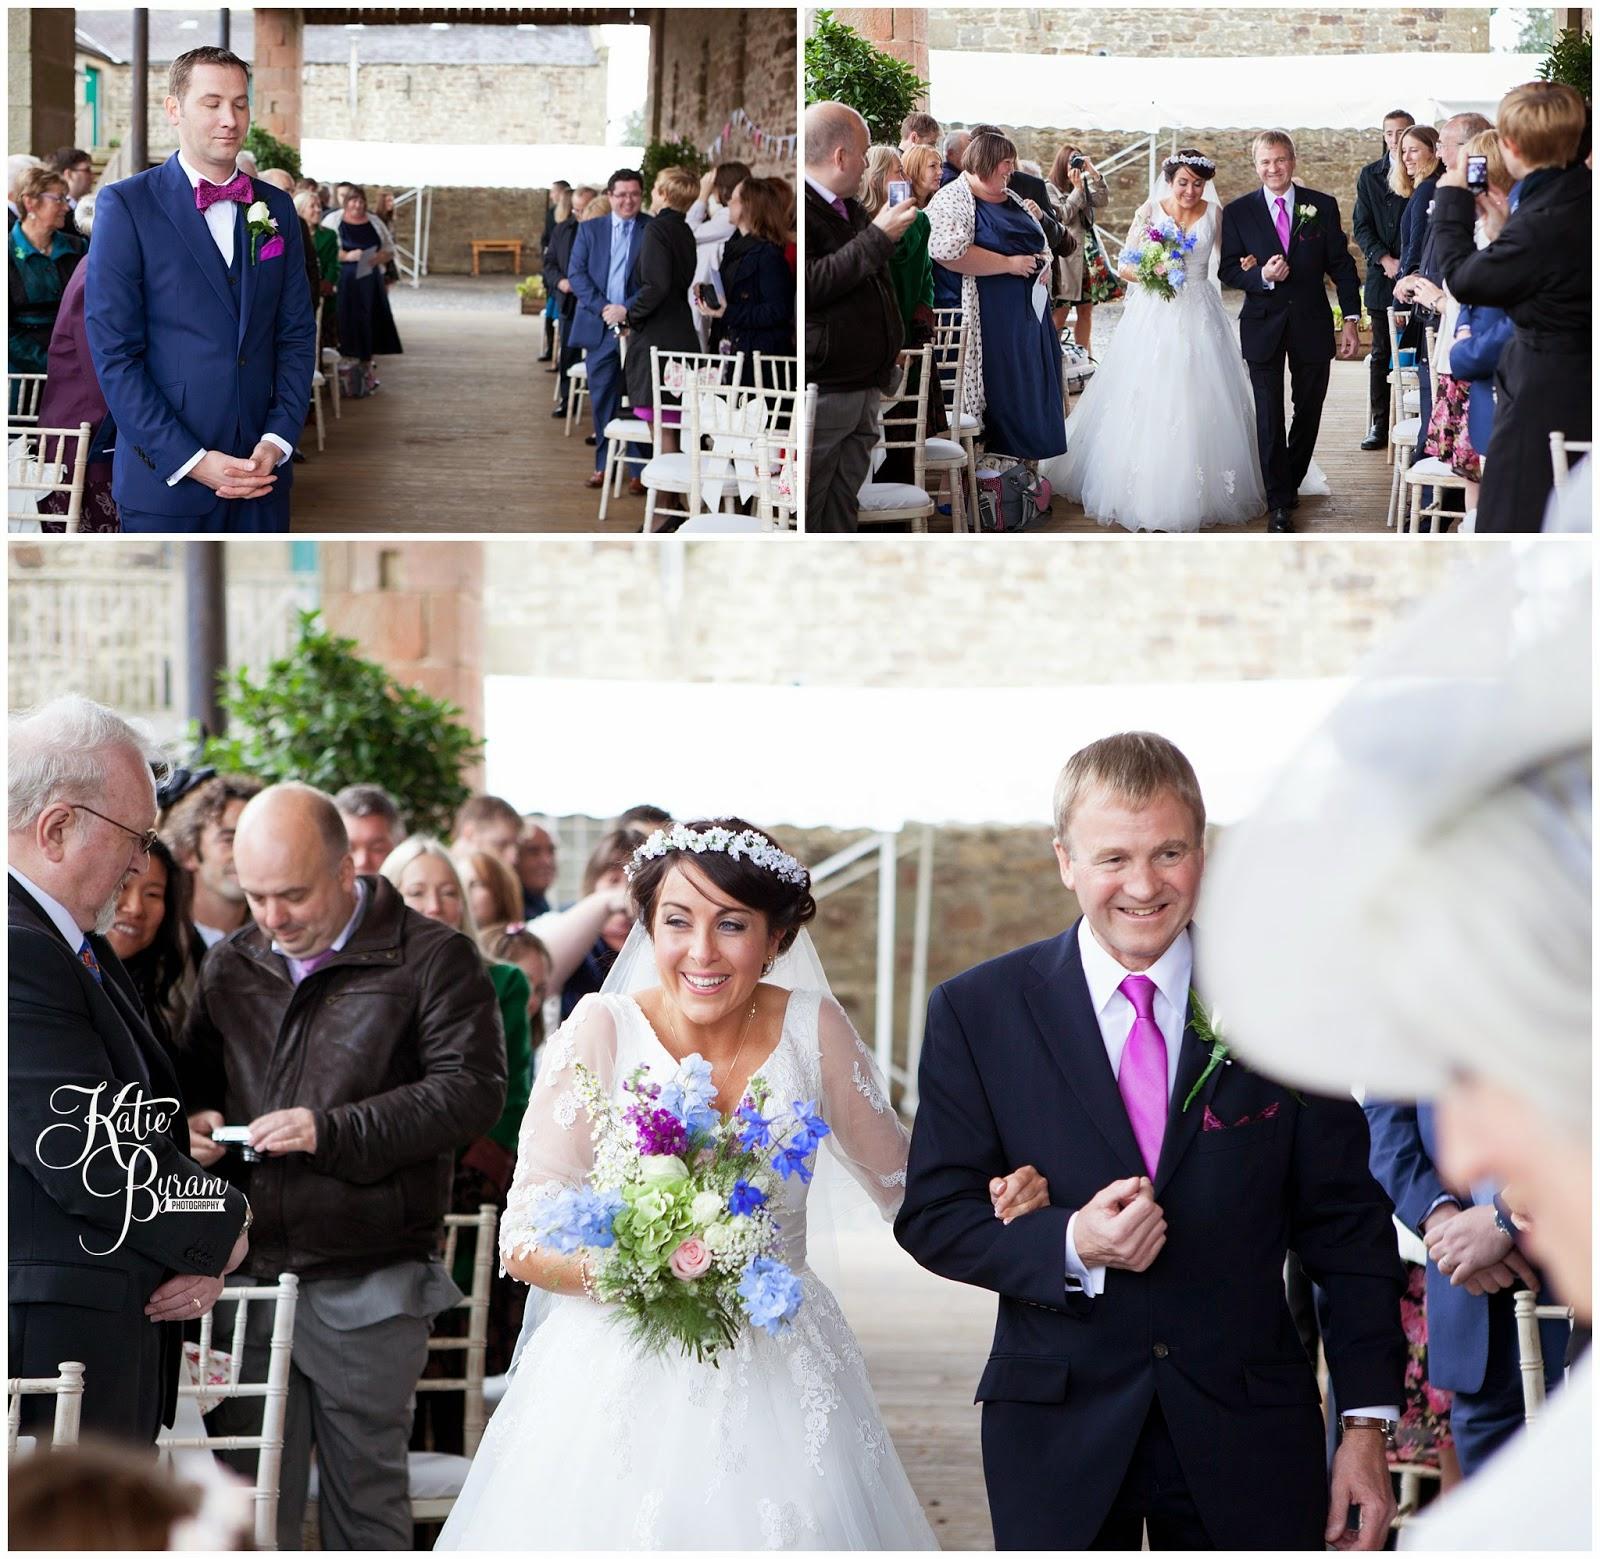 high house farm brewery wedding, katie byram photography